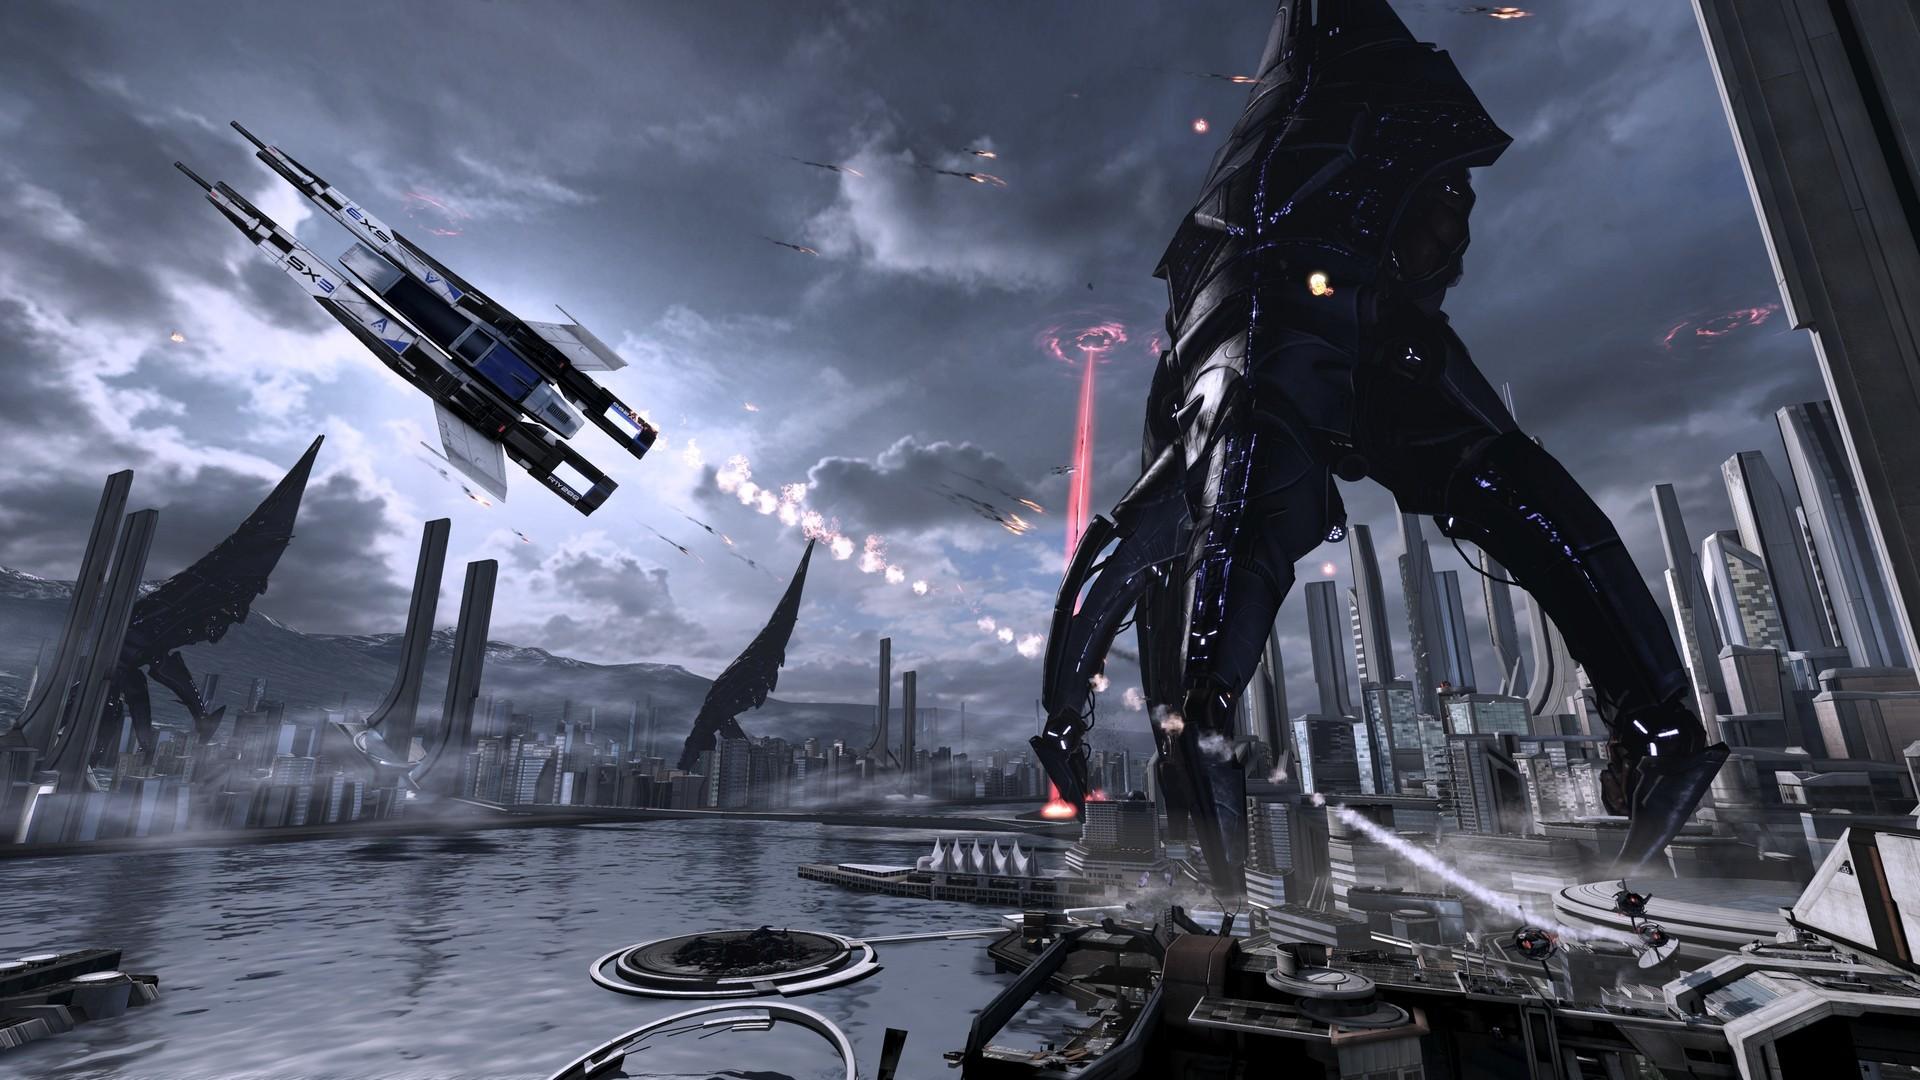 Mass Effect, N7, Galaxy, Sci-Fi, RPG, BioWare, N7